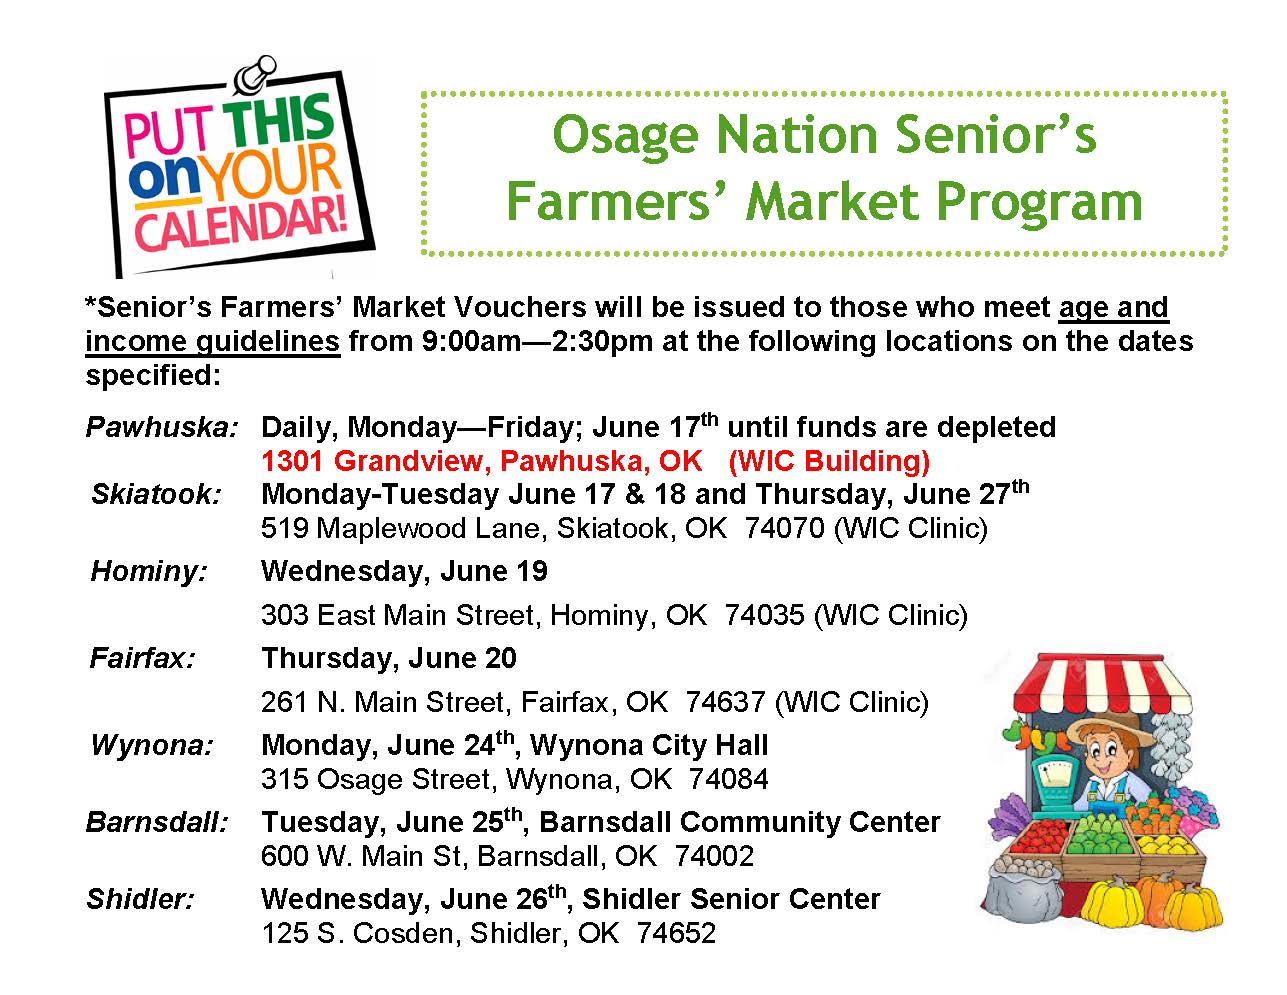 Osage Nation's Senior's Farmers' Market Program